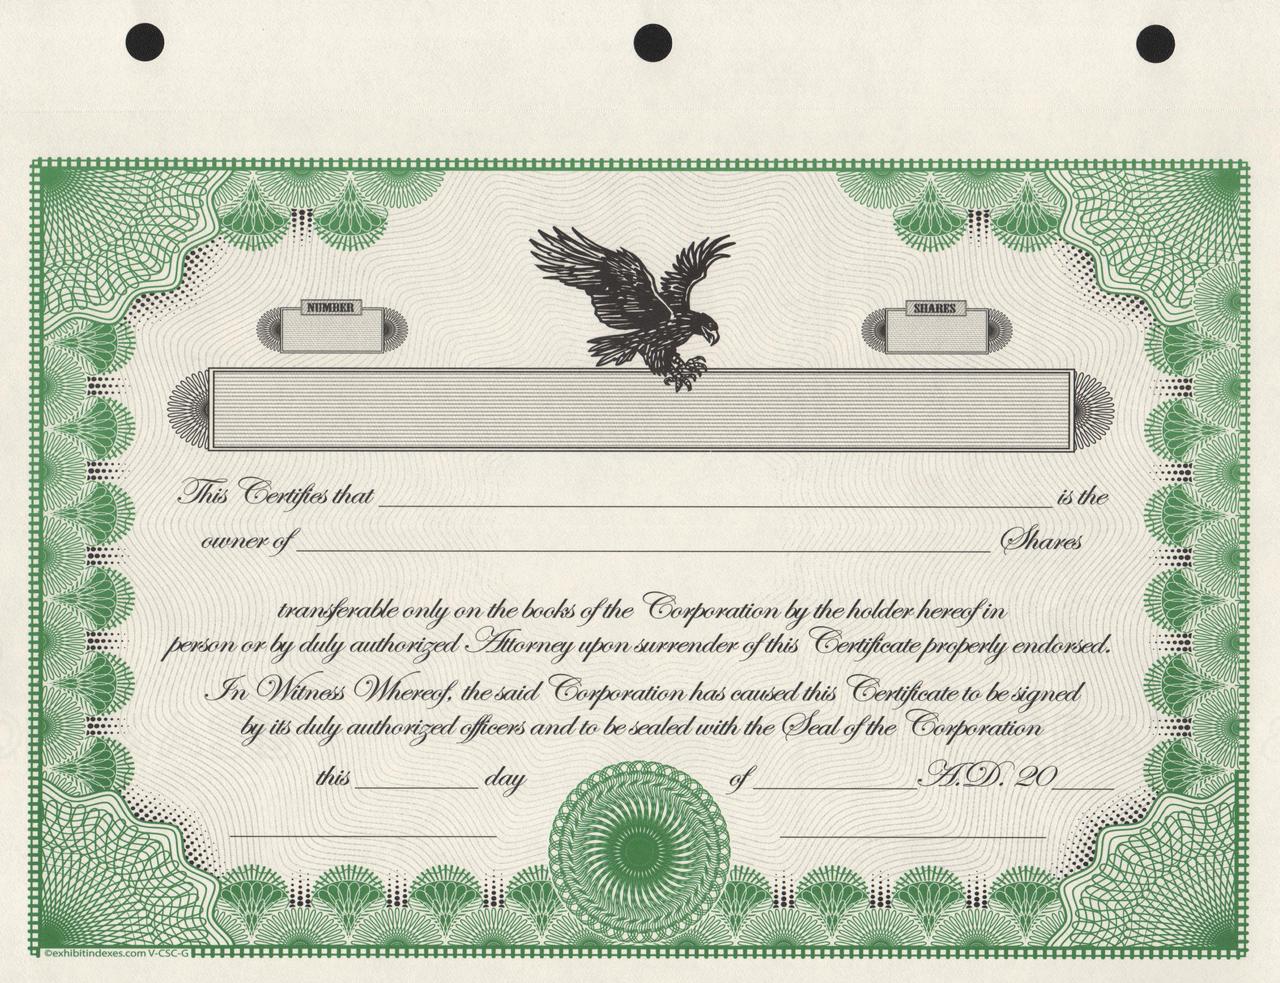 corporate certificates certificate sample template templates downloadable professional bond award printable forms nurse nursing itsnudimension